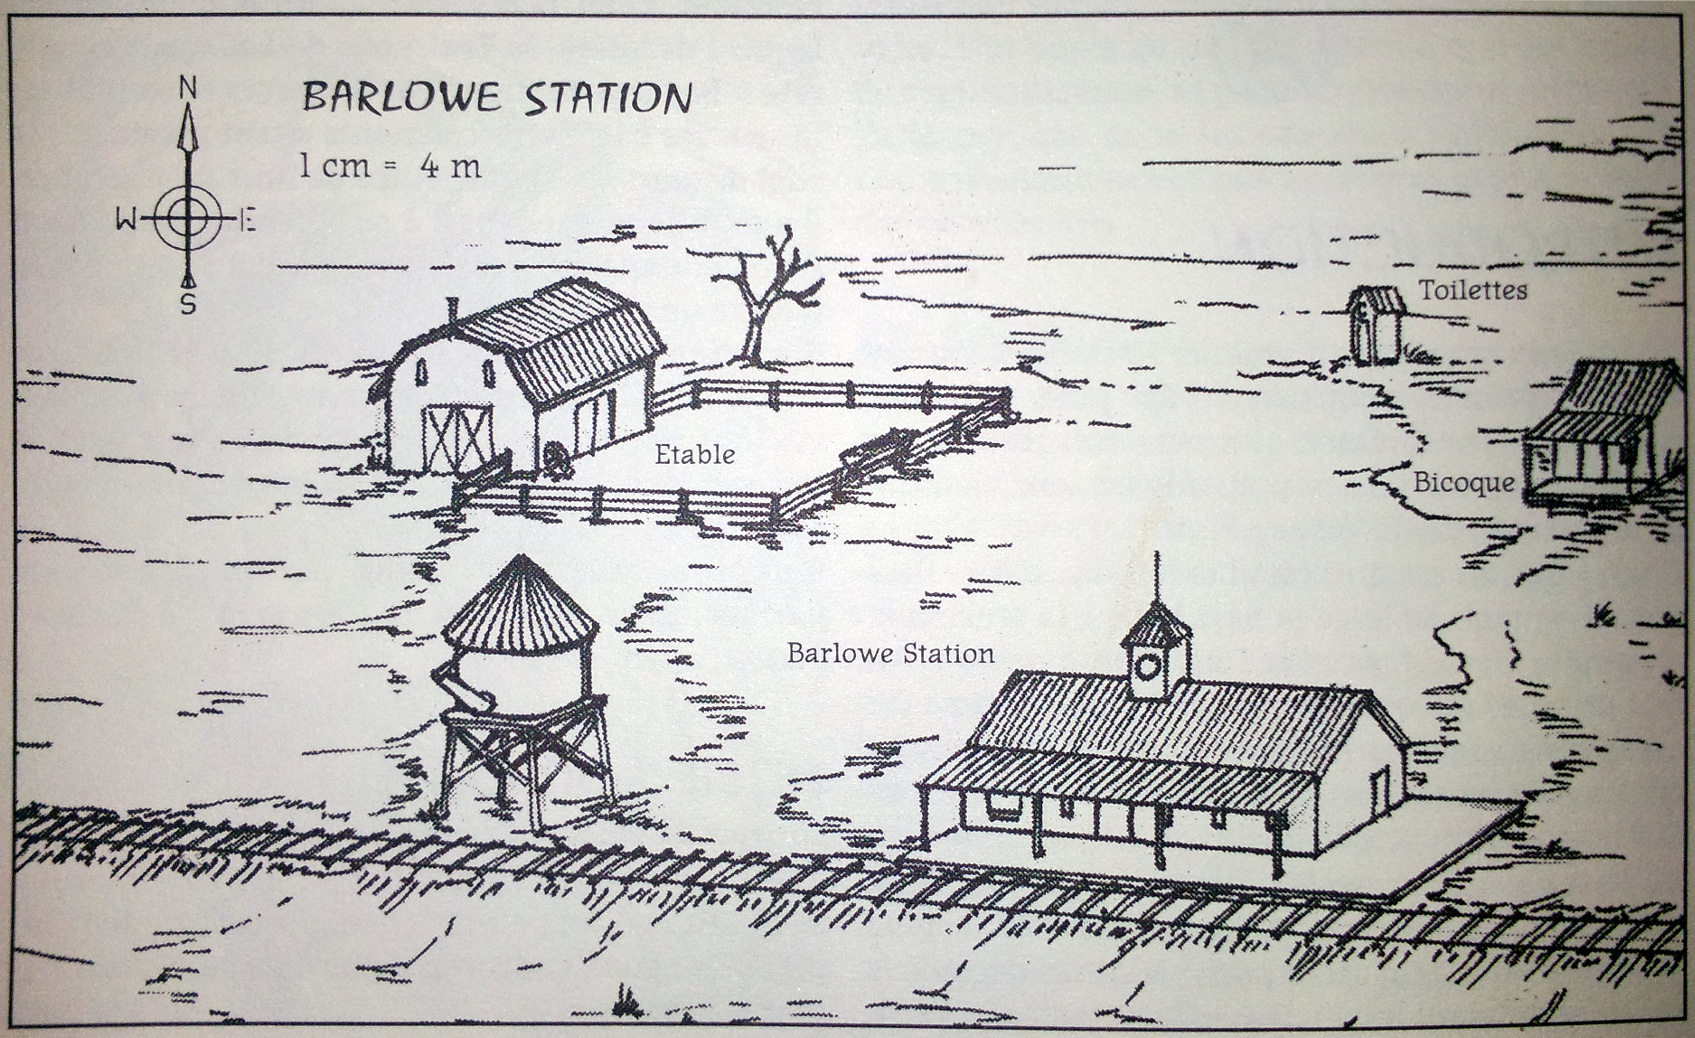 Barlowe station